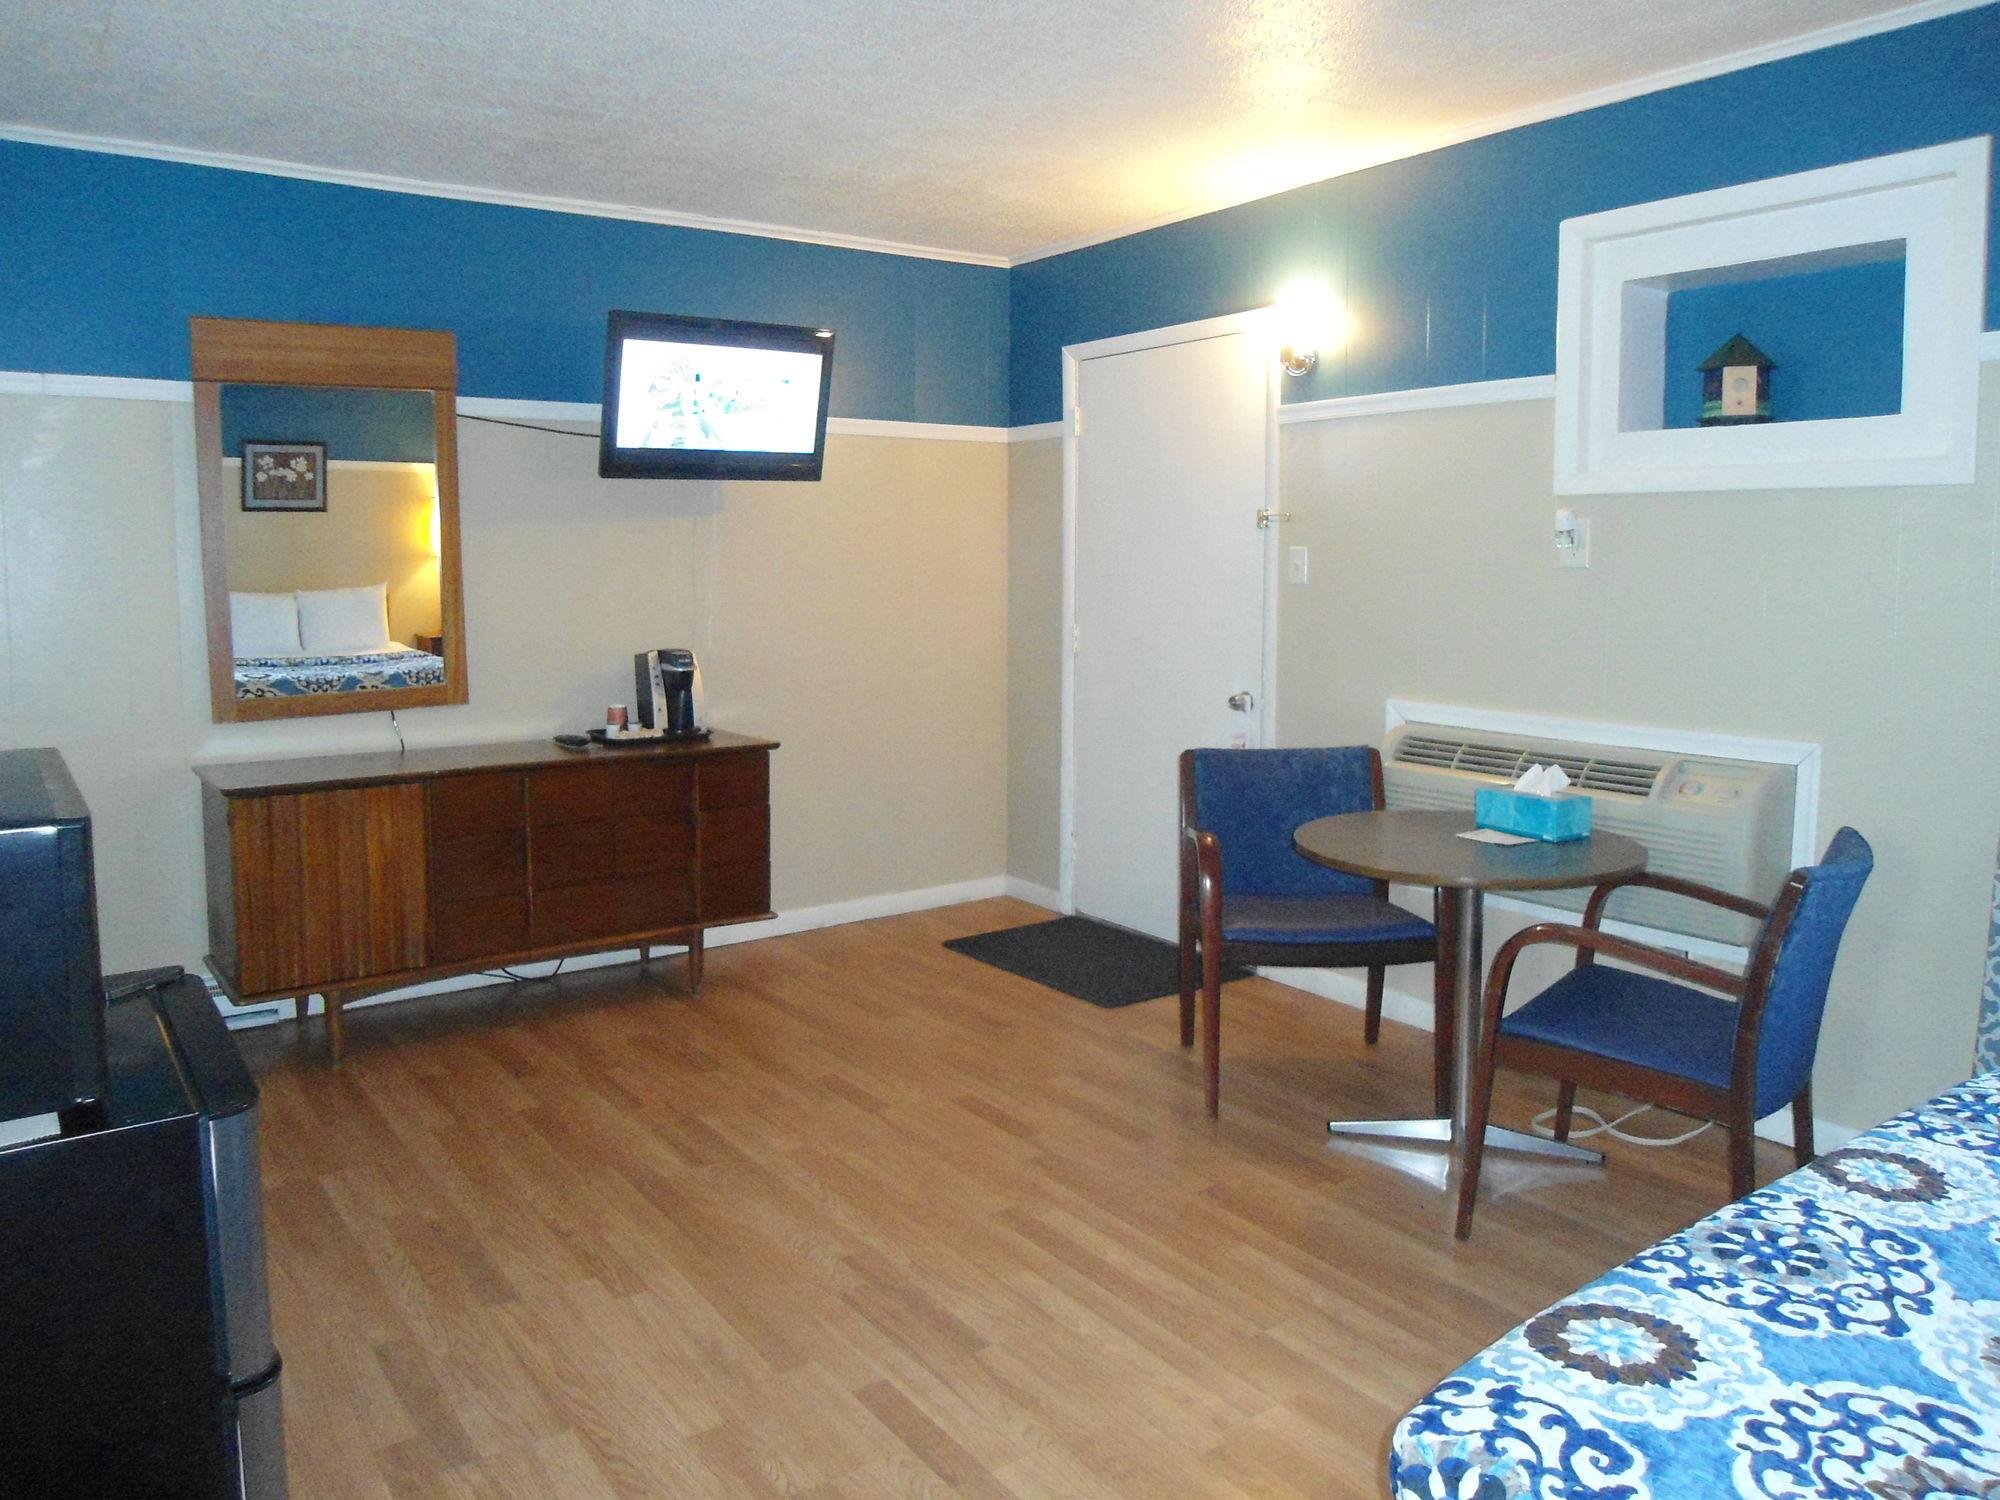 Stroudsburg Hotel Coupons For Stroudsburg Pennsylvania